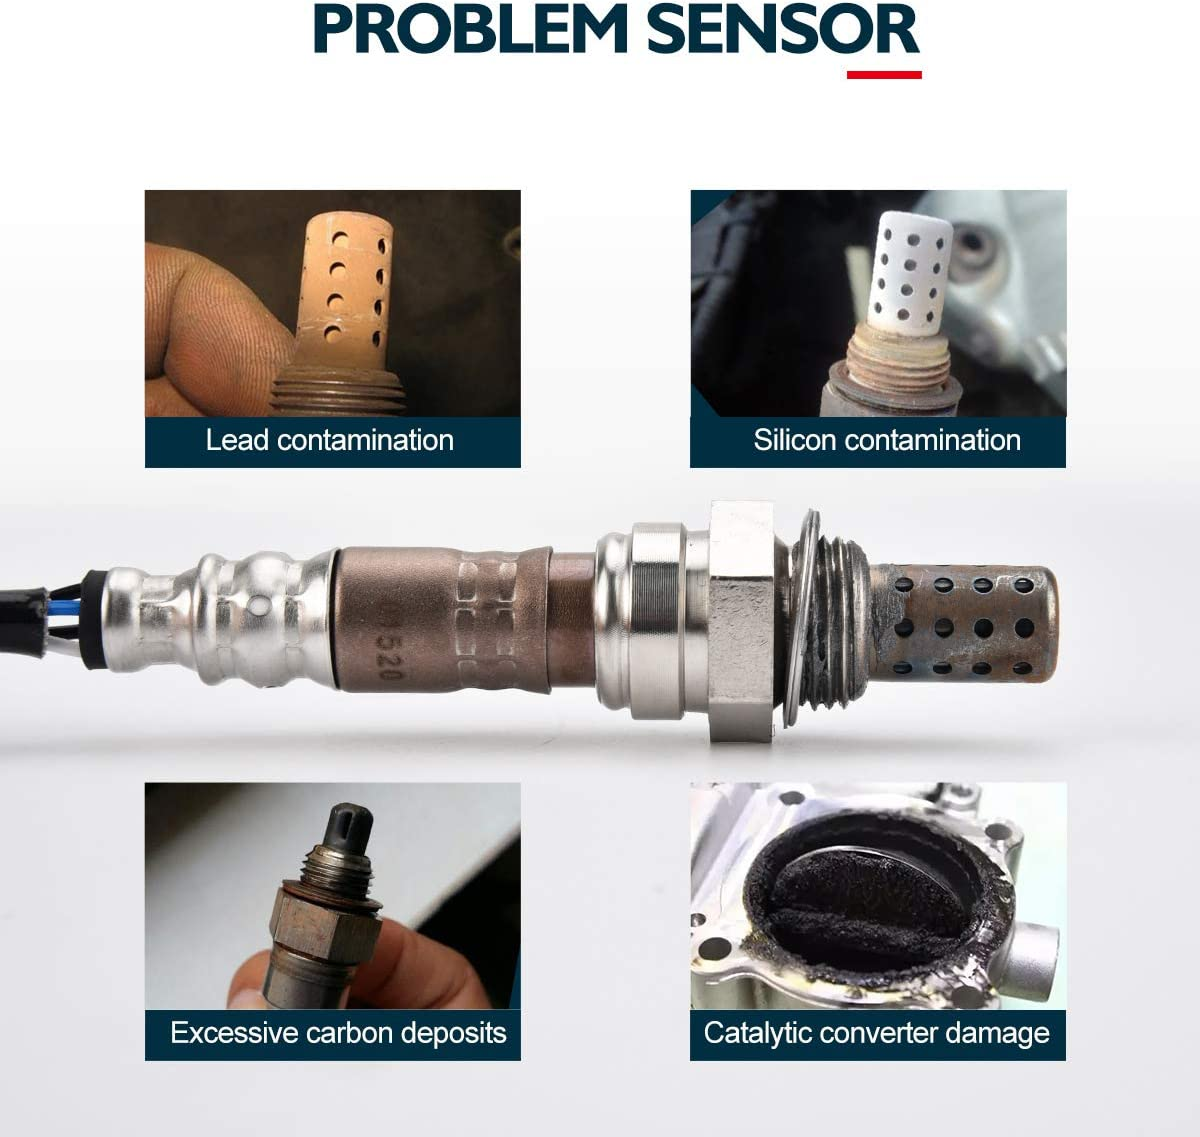 Lexus LX470 KAX 234-4162 Oxygen Sensor Original Equipment Replacement 250-24154 O2 Sensor Up//Downstream Compatible for Toyota 4Runner//Corolla//Tacoma//Chevrolet Prizm